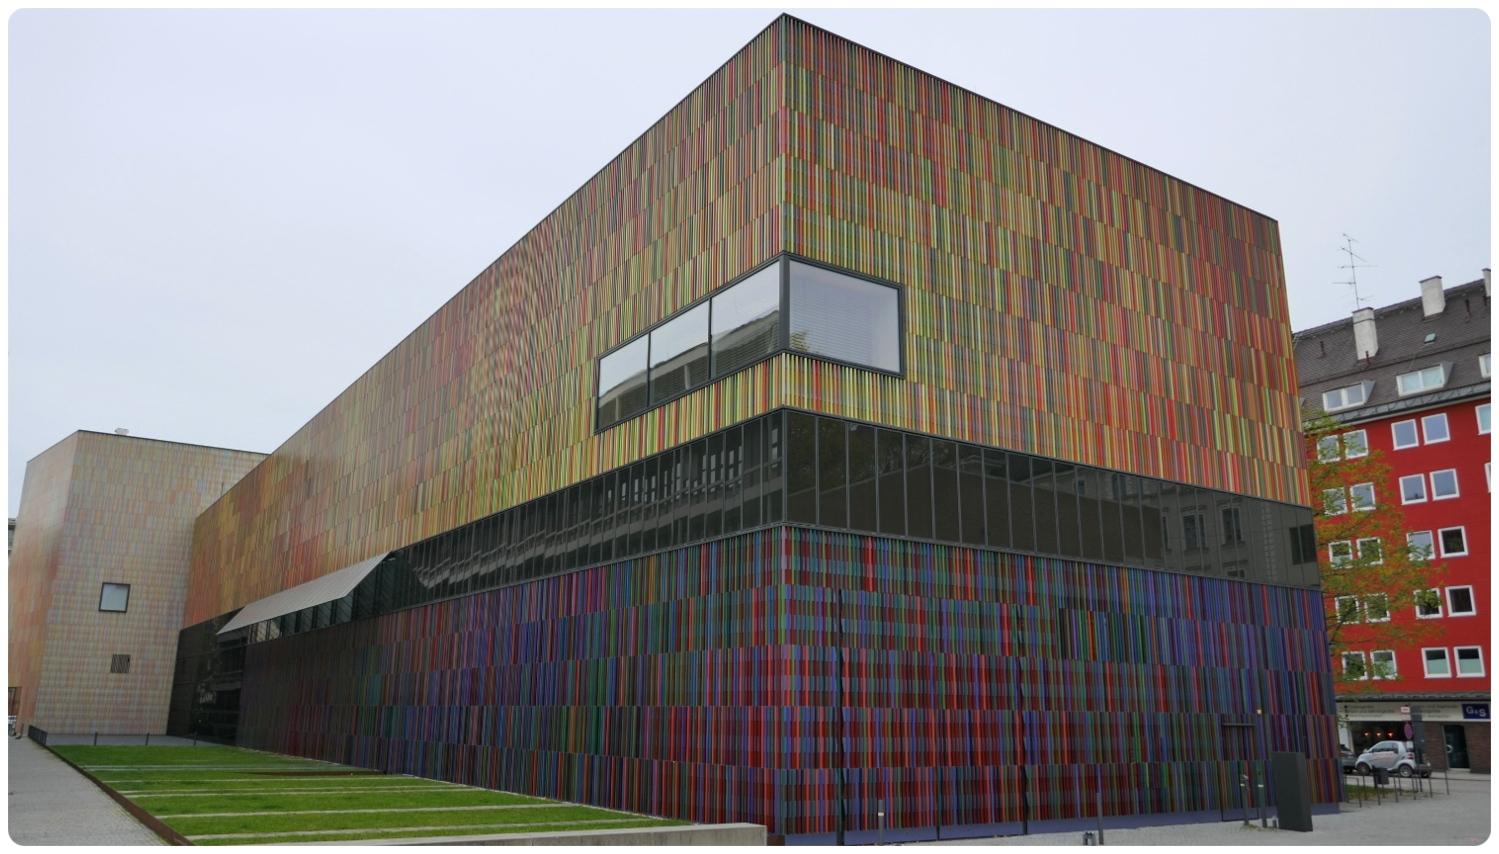 Museum Brandhorst in Munich, Germany is a modern art museum.